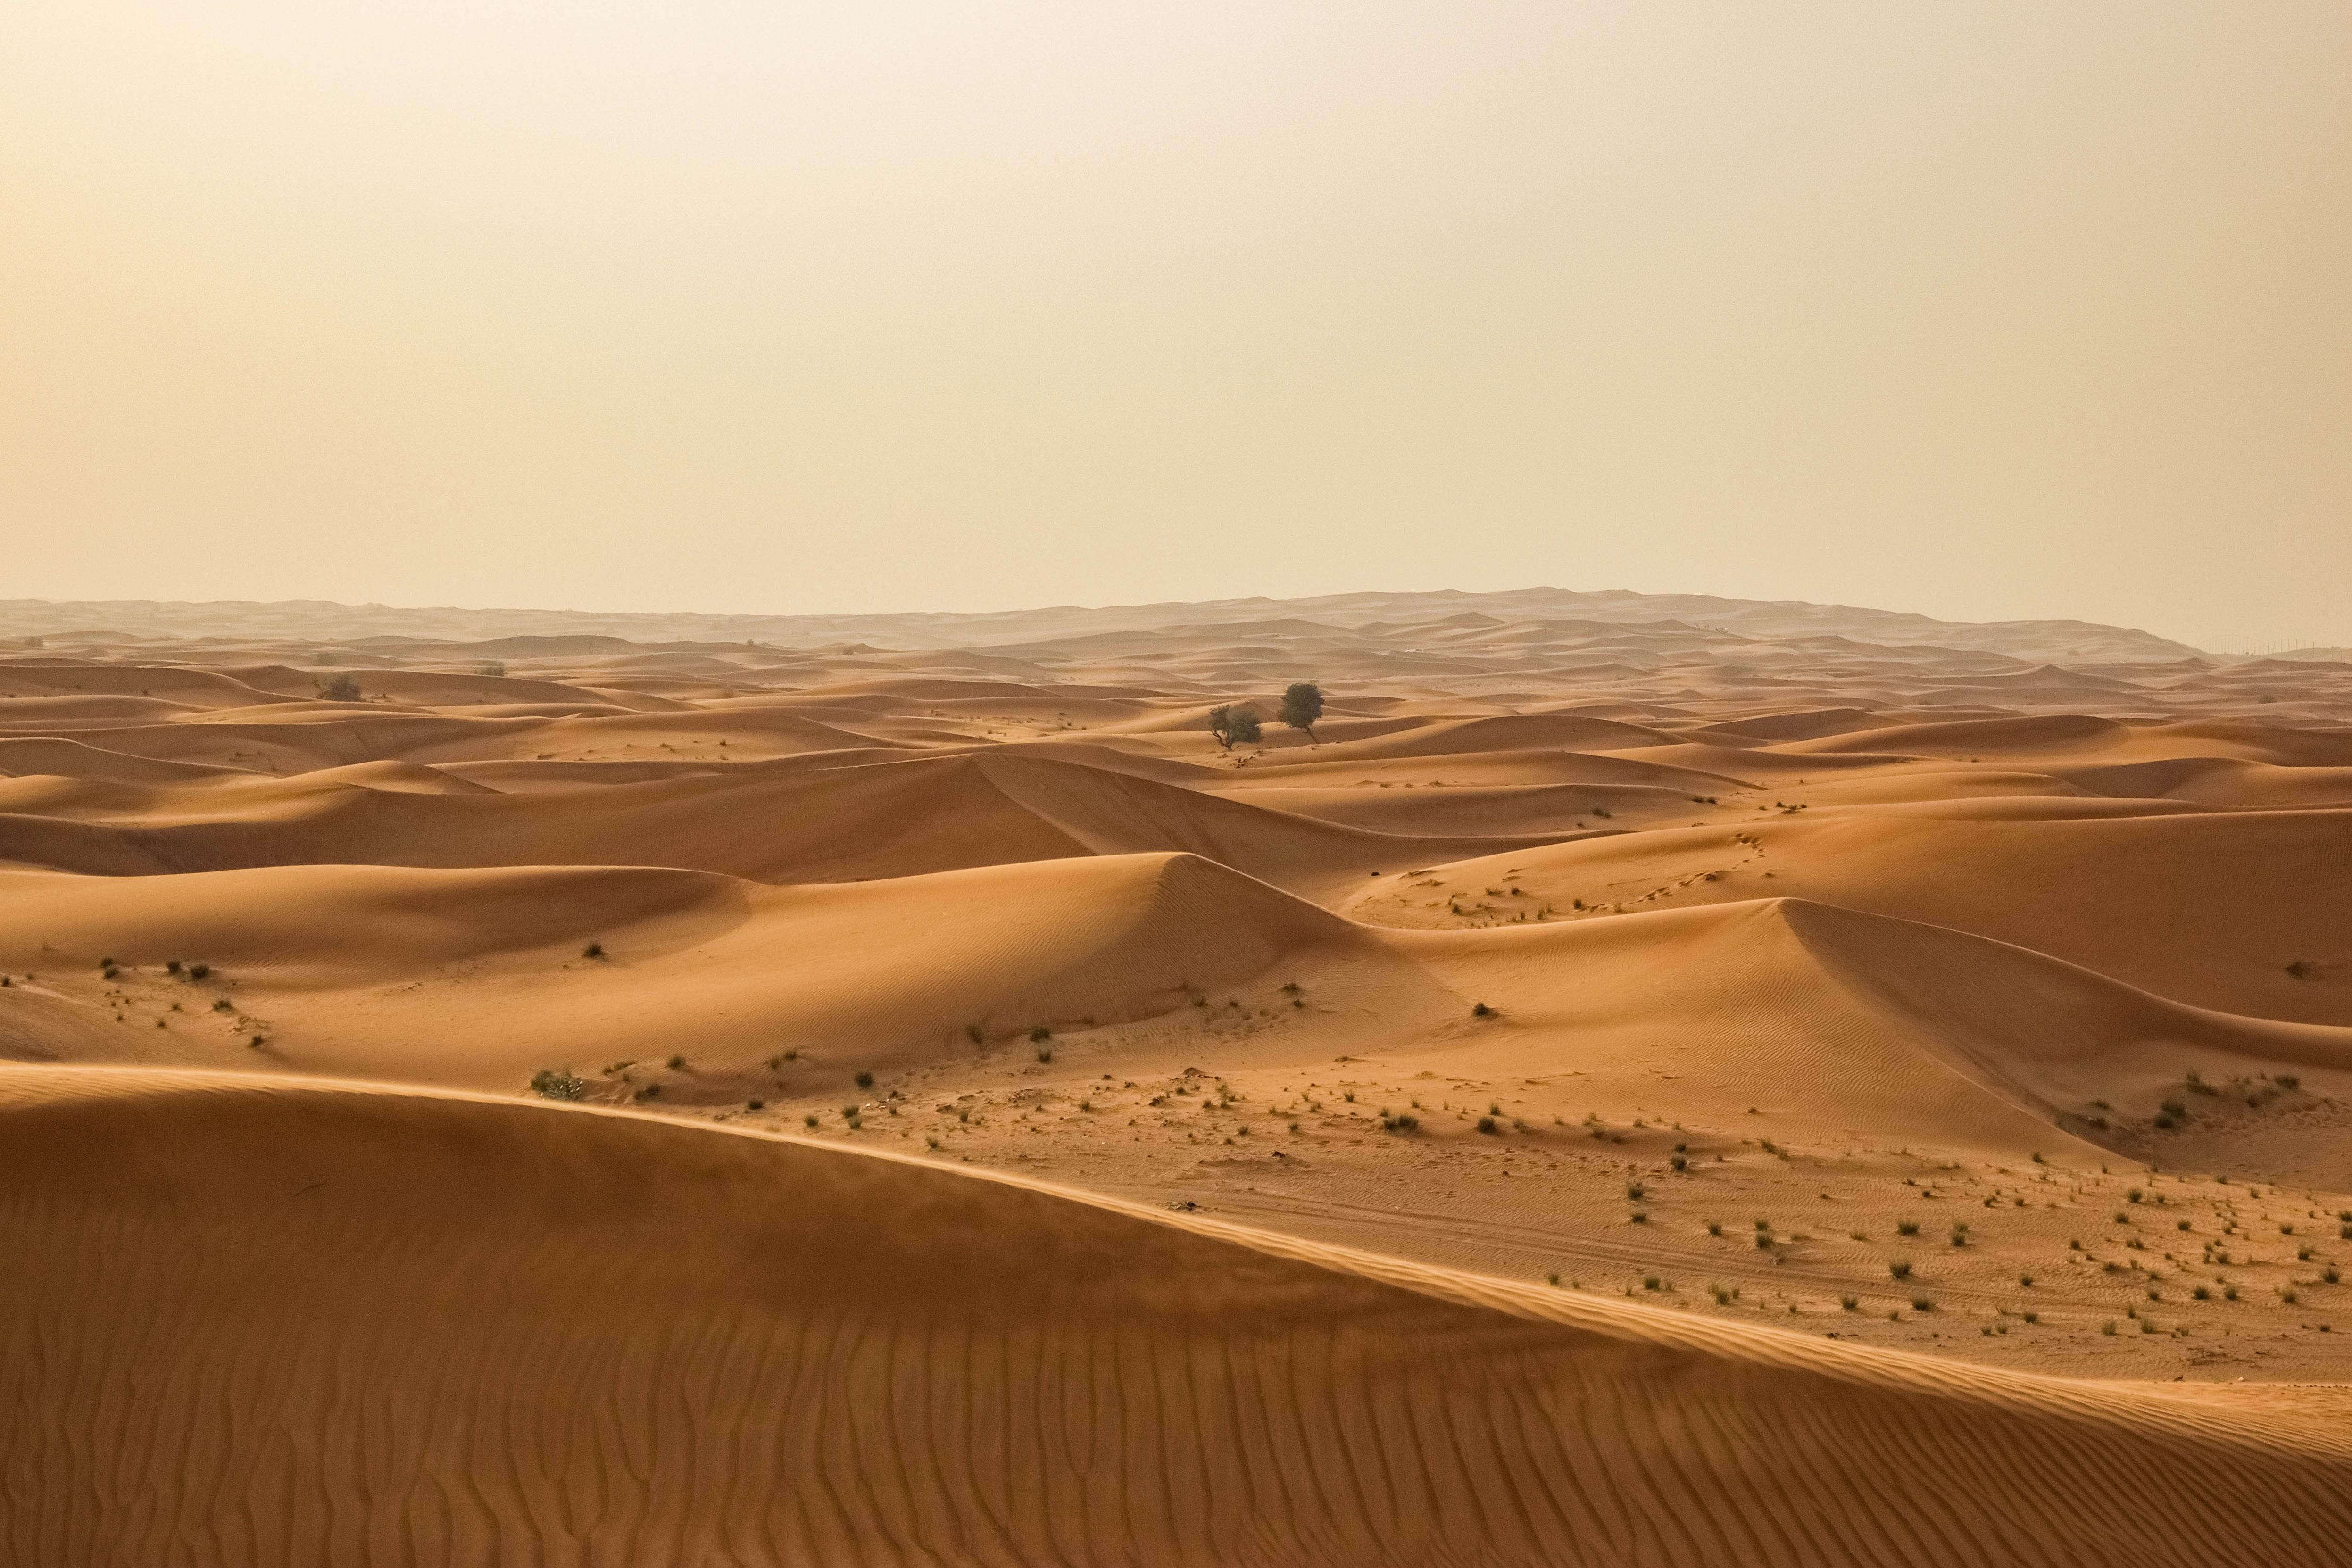 Картинка африка пустыня